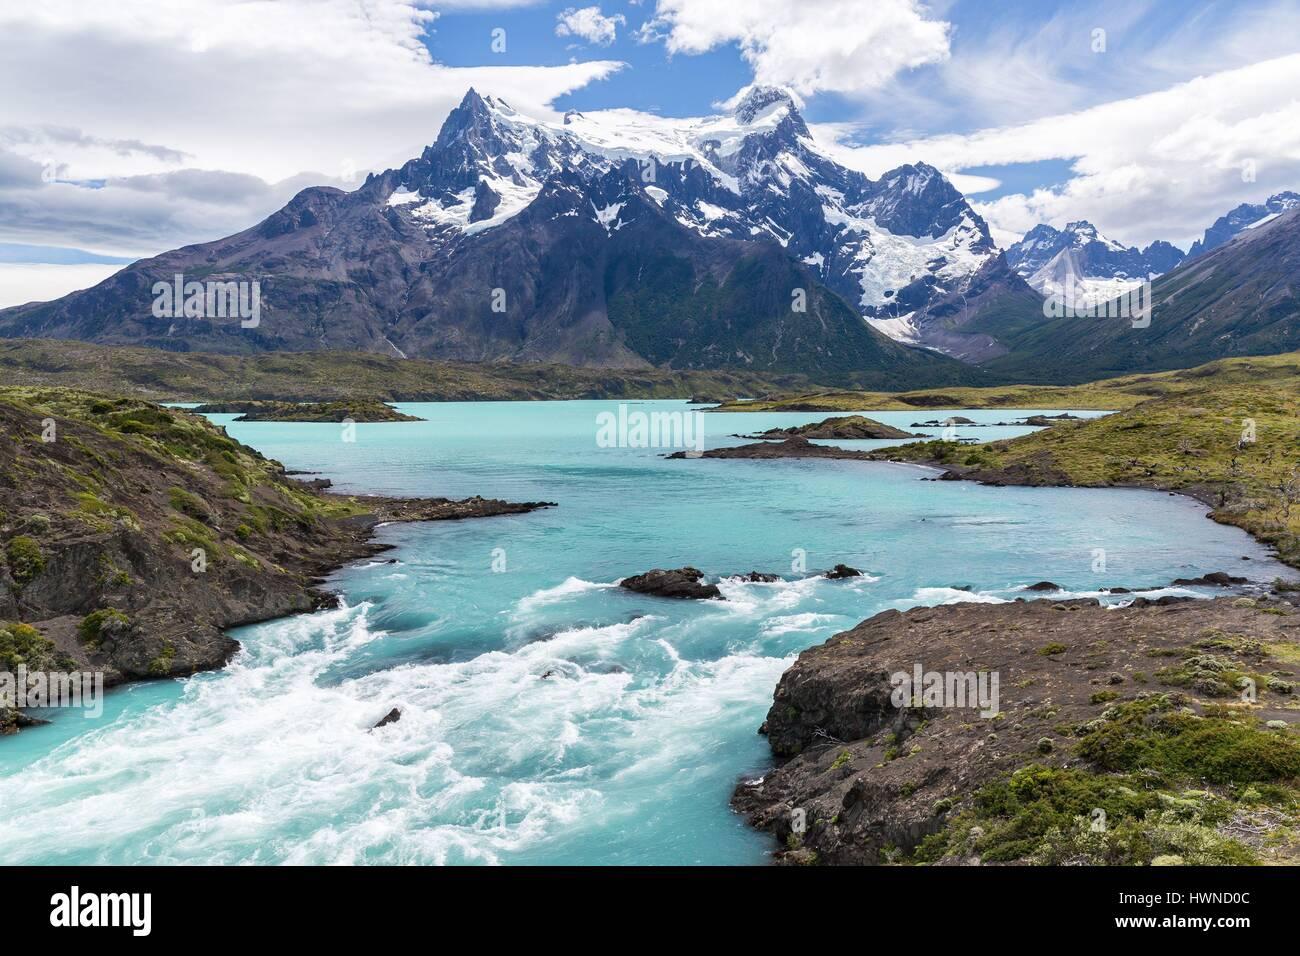 Patagonia South America >> Chile, Patagonia, Aysen region, Torres del Paine national ...